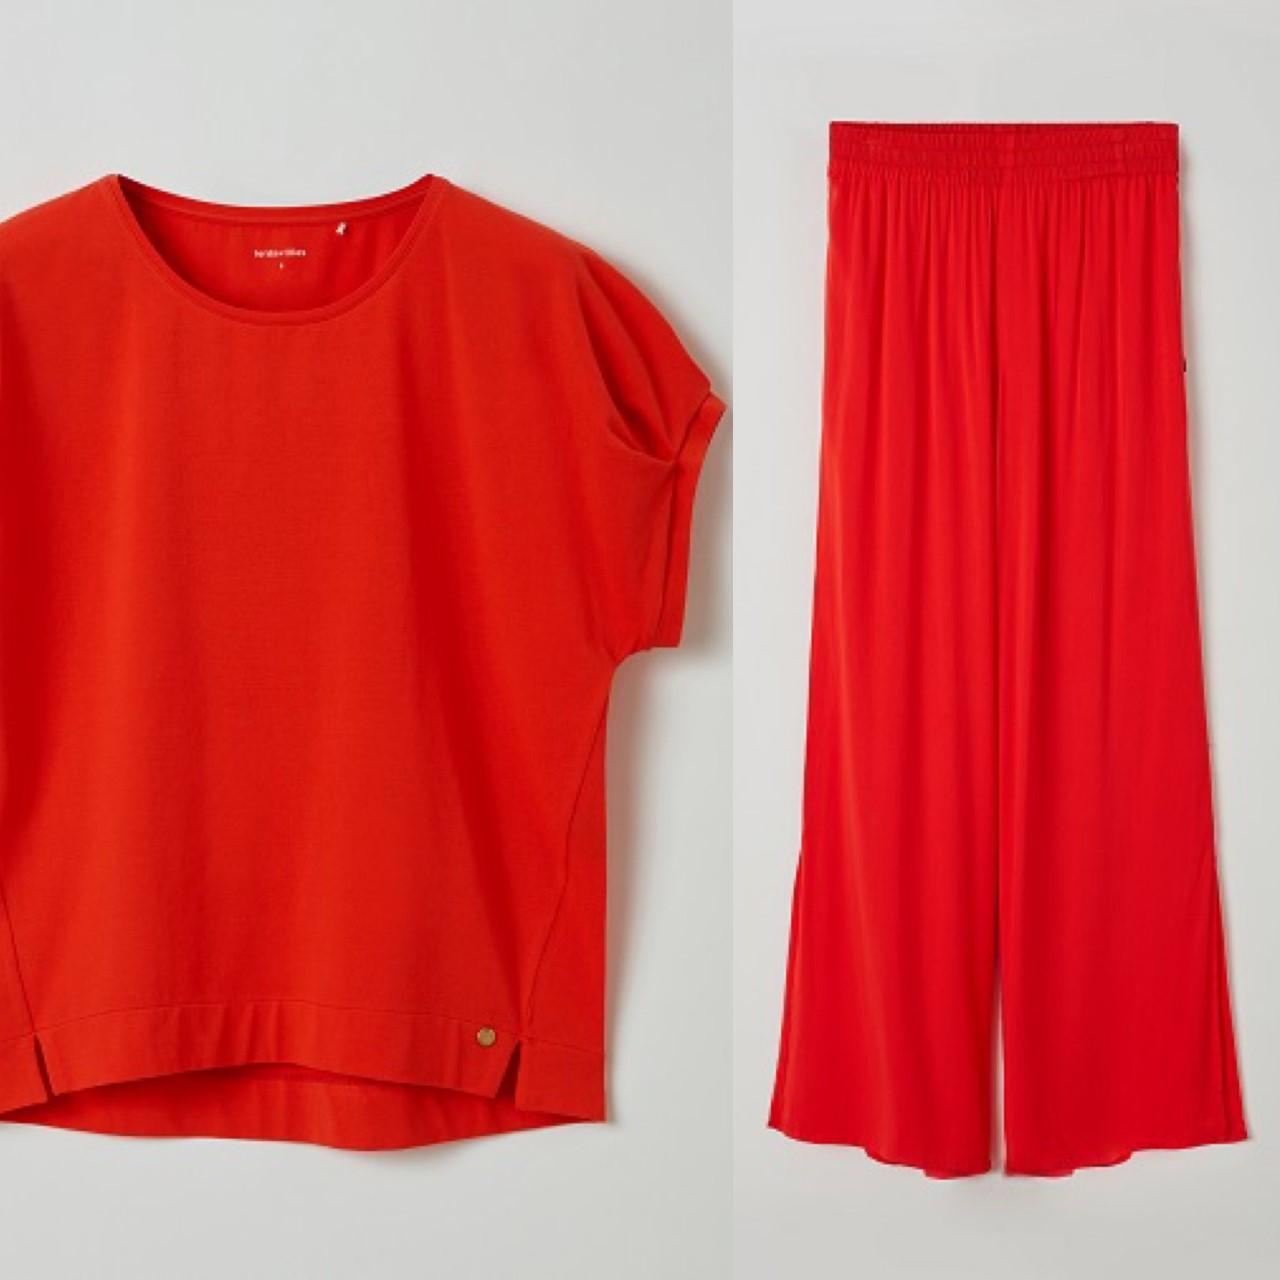 Lords & Lilies T-Shirt + Lange Broek